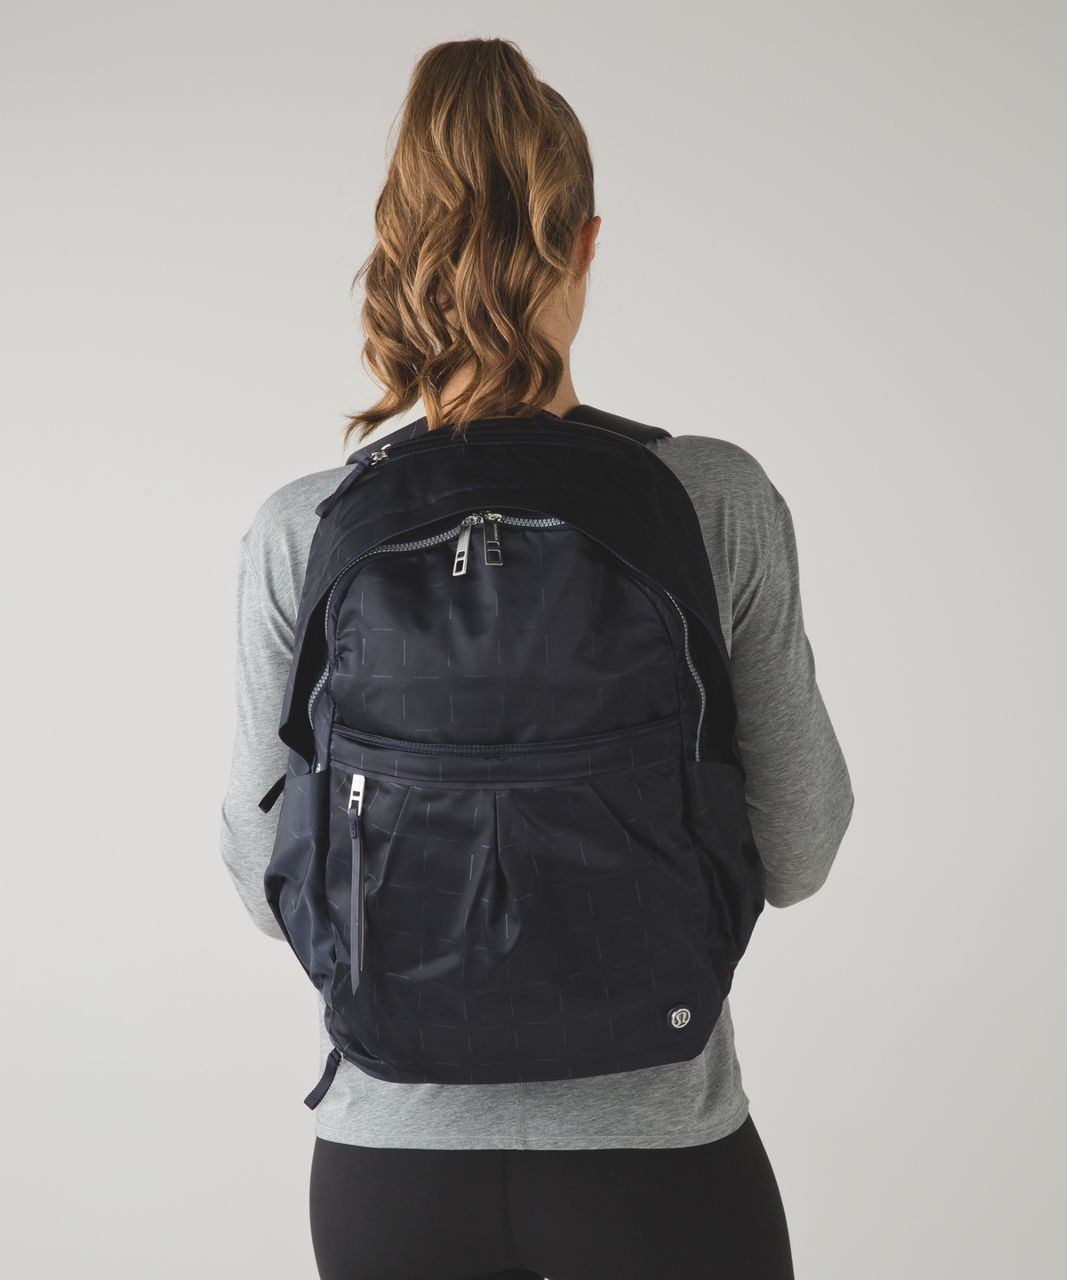 Lululemon Pack It Up Backpack Tikki Tac Embossed Naval